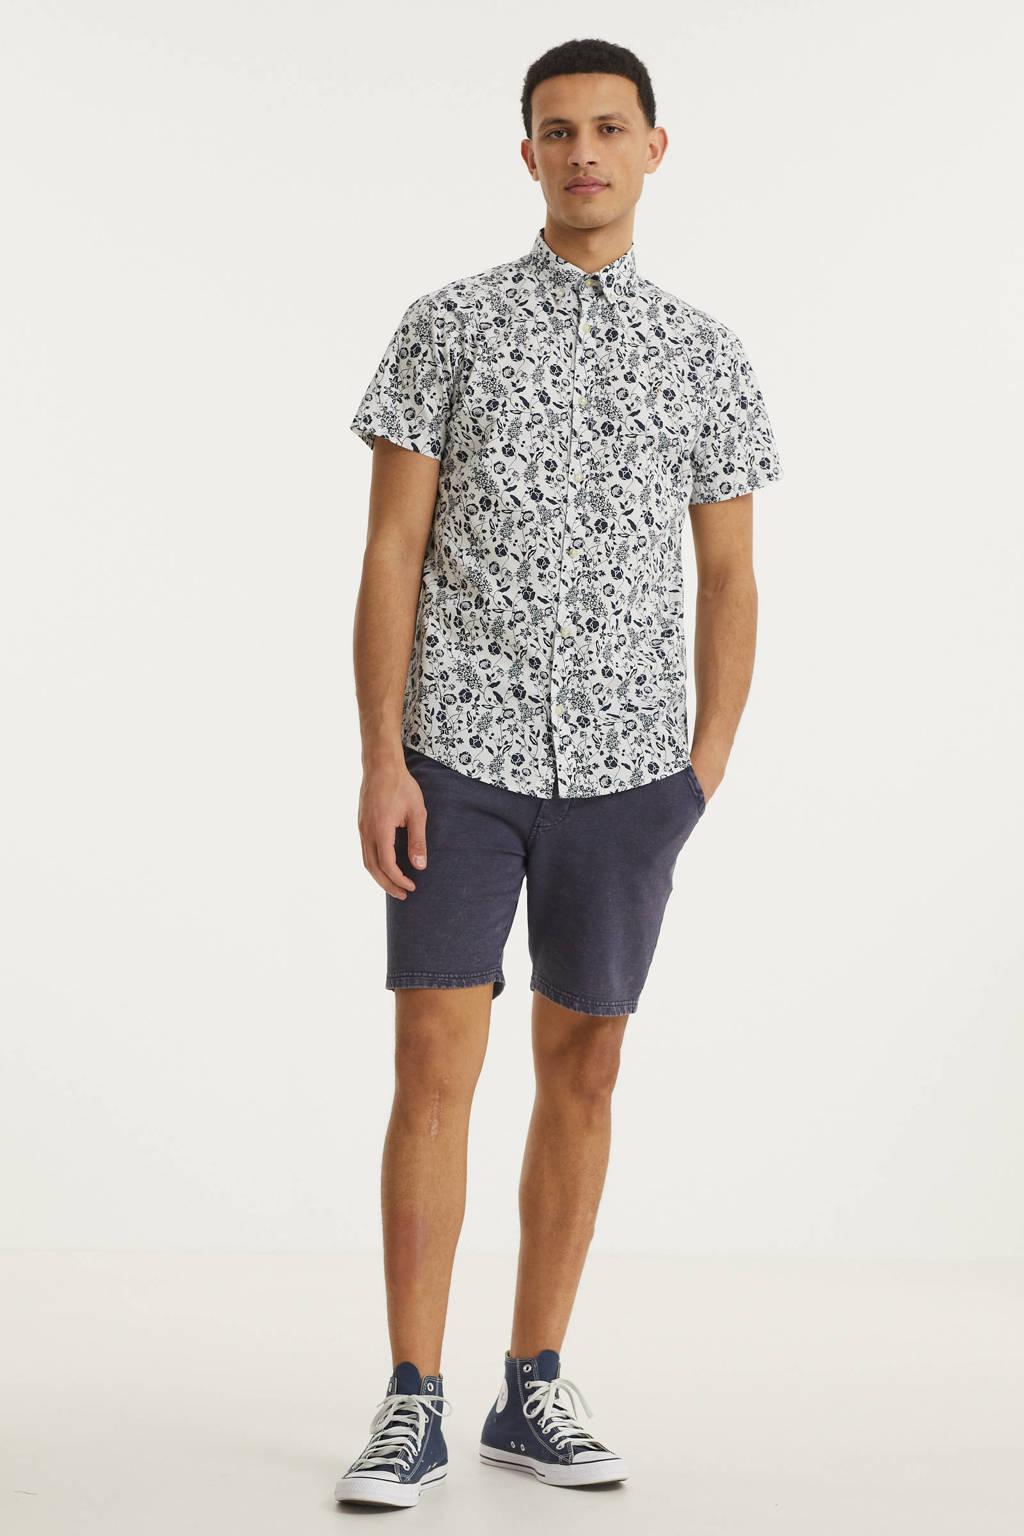 PRODUKT gebloemd regular fit overhemd Jack wit/donkerblauw, Wit/donkerblauw